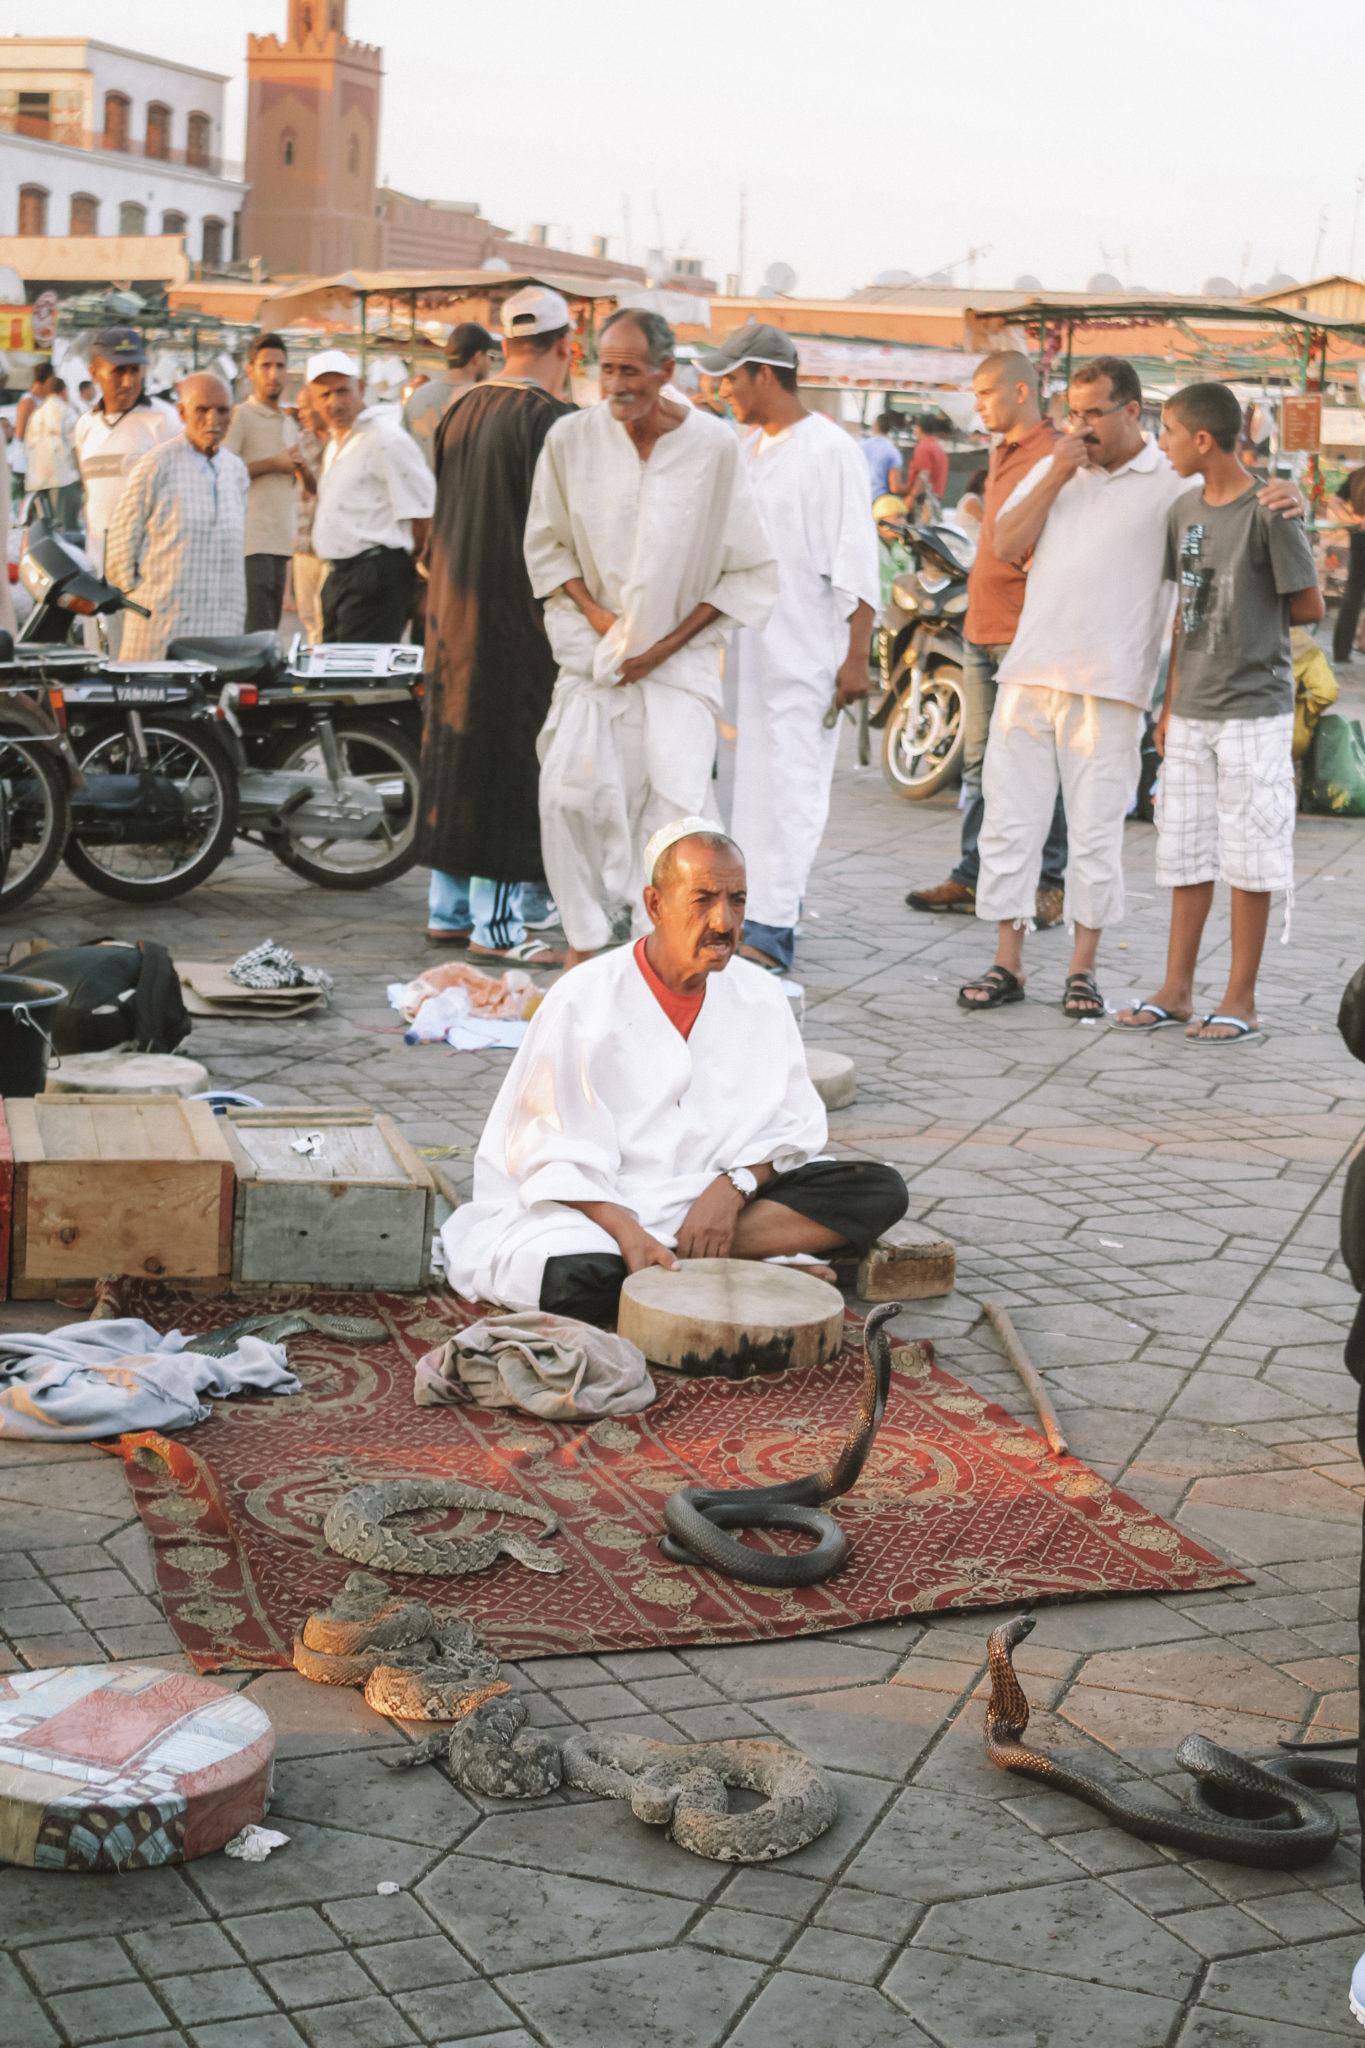 Marrakech Morocco | WORLD OF WANDERLUST